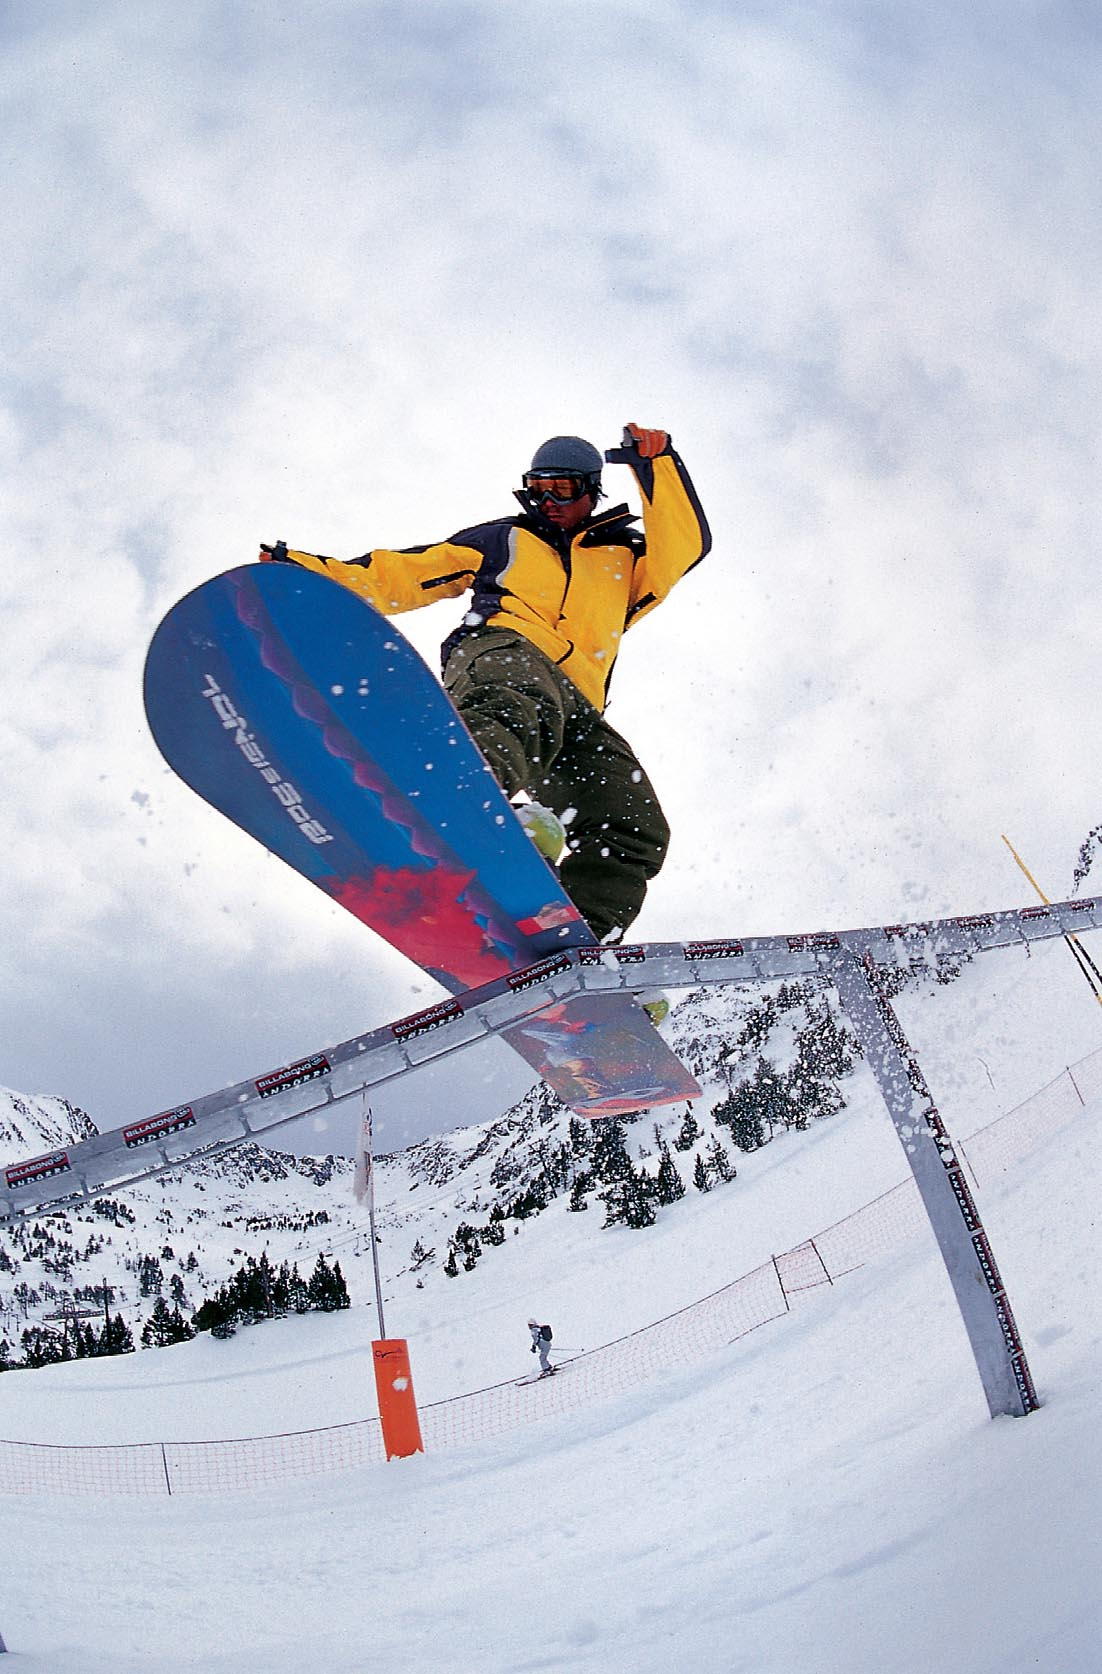 SnowPark de Ordino - Arcalis